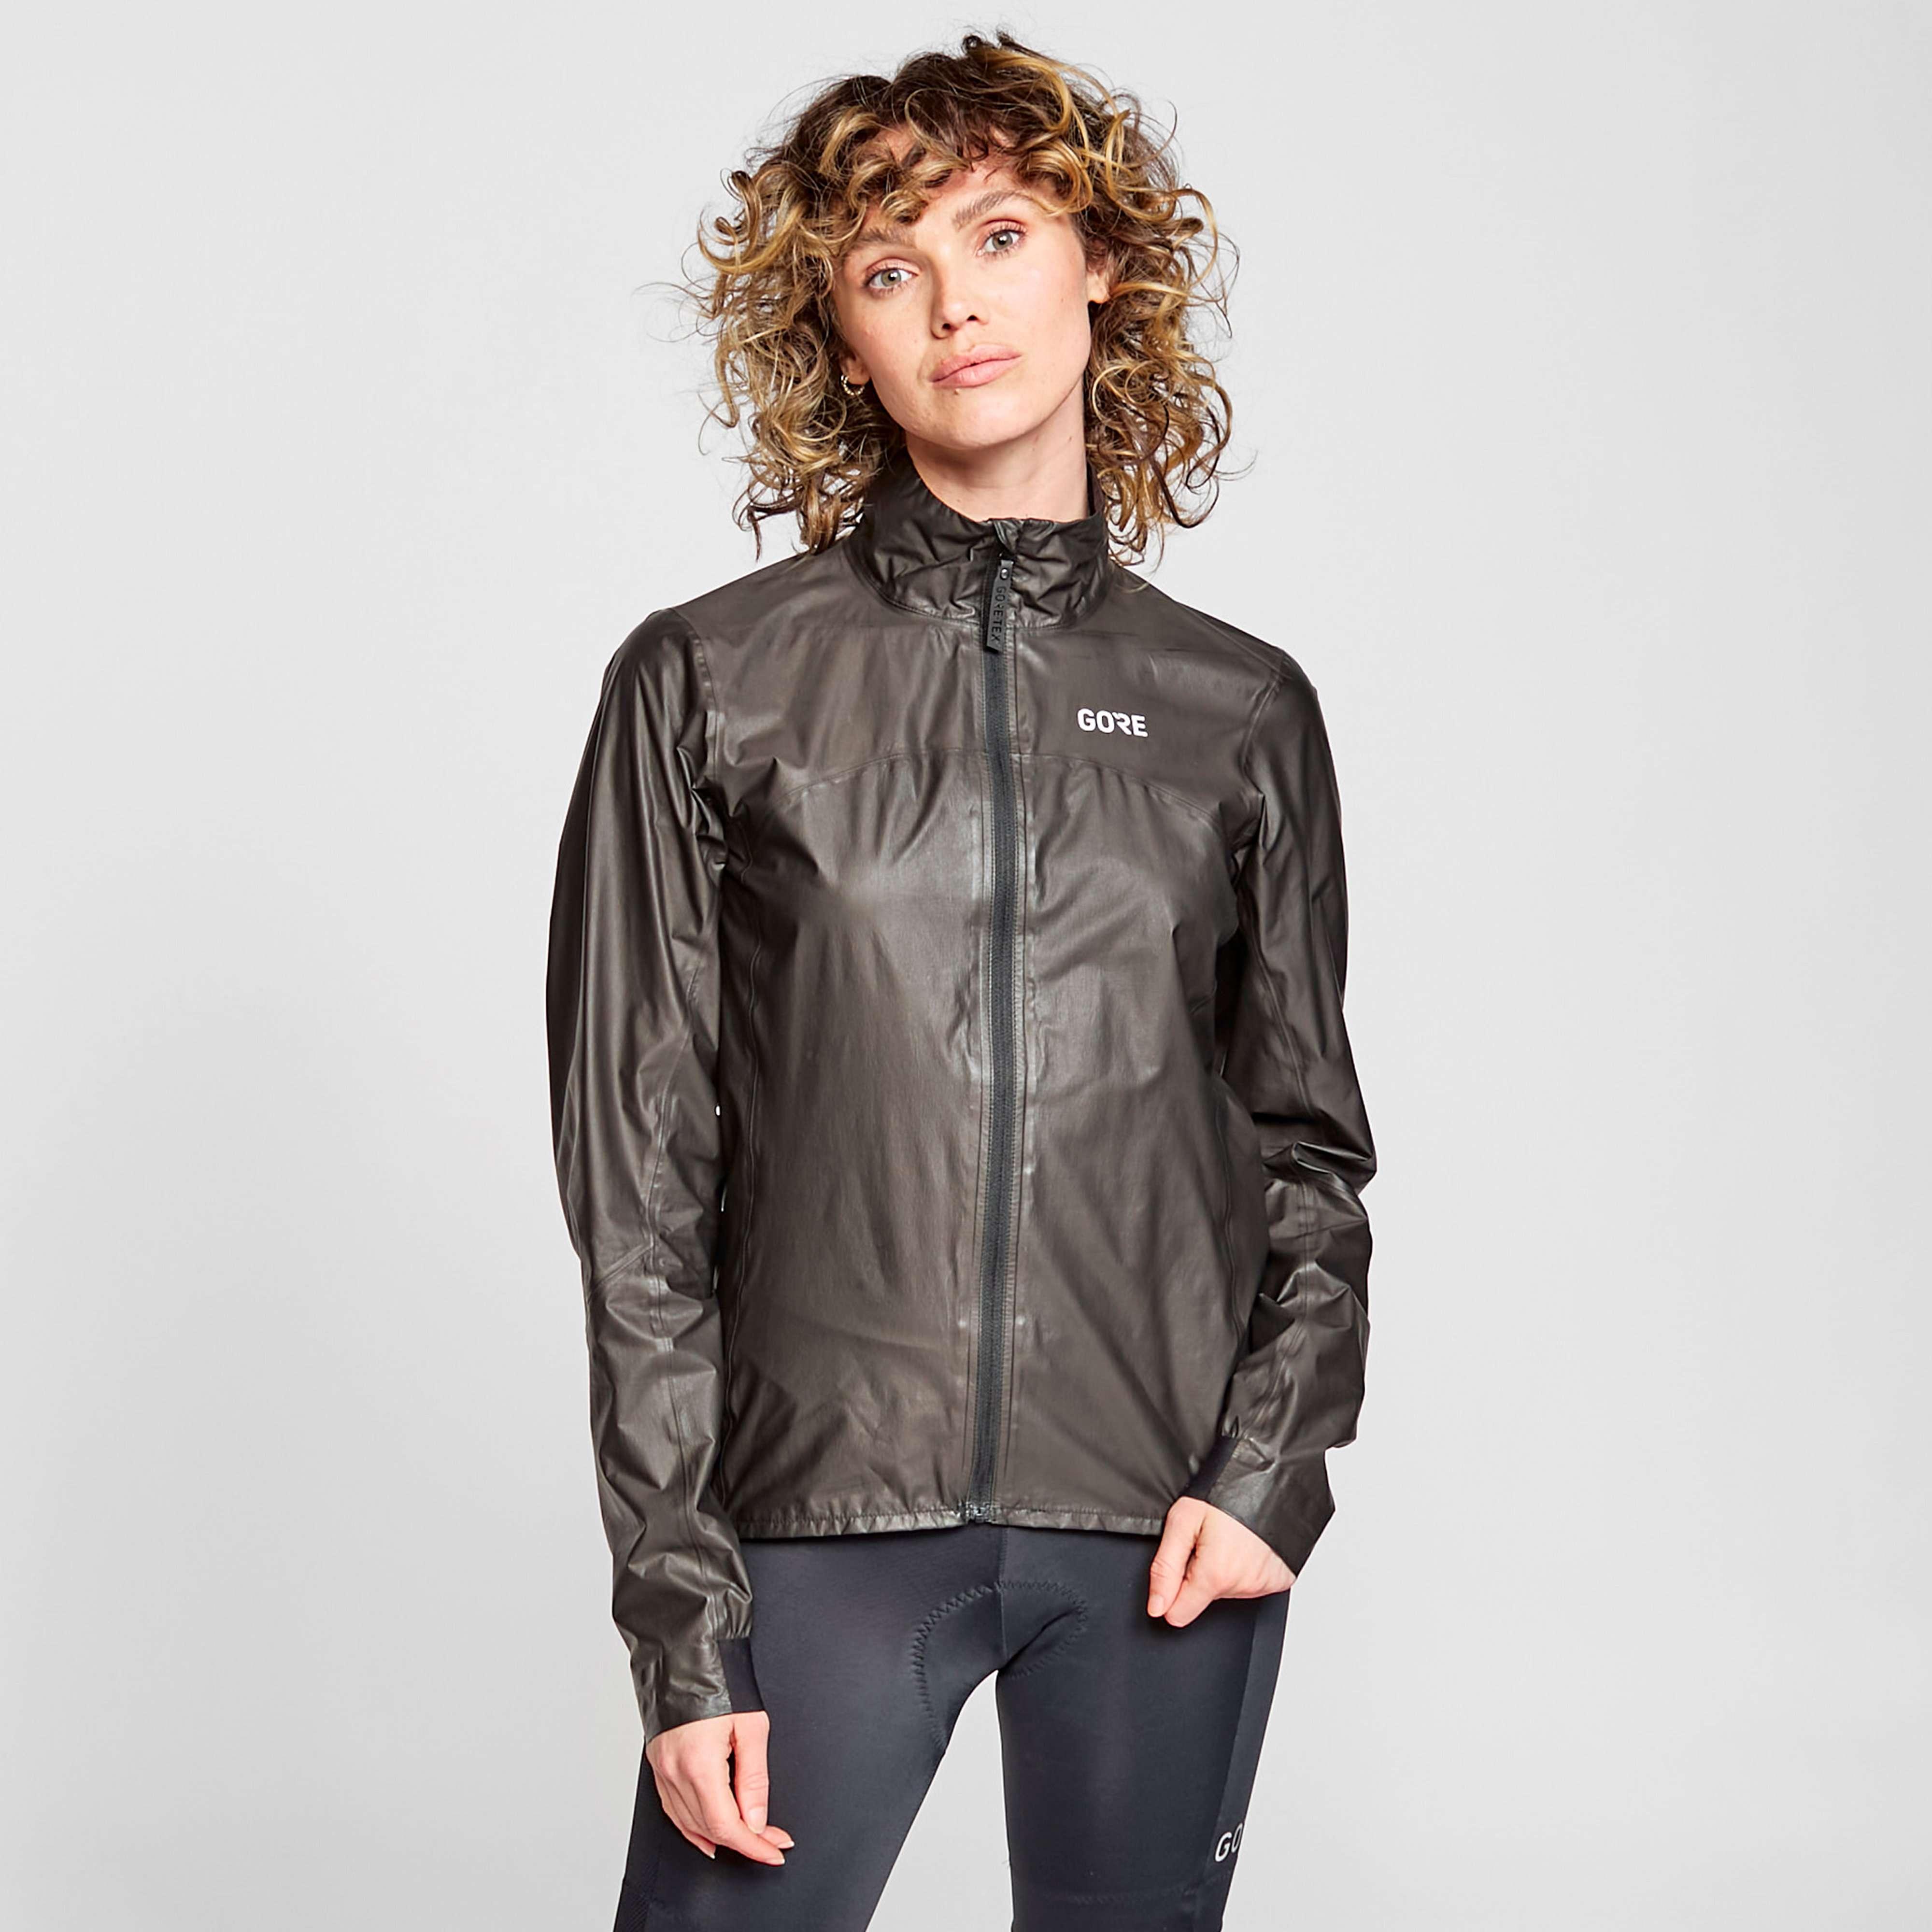 GORE Women's C7 GORE-TEX® Shakedry™ Jacket